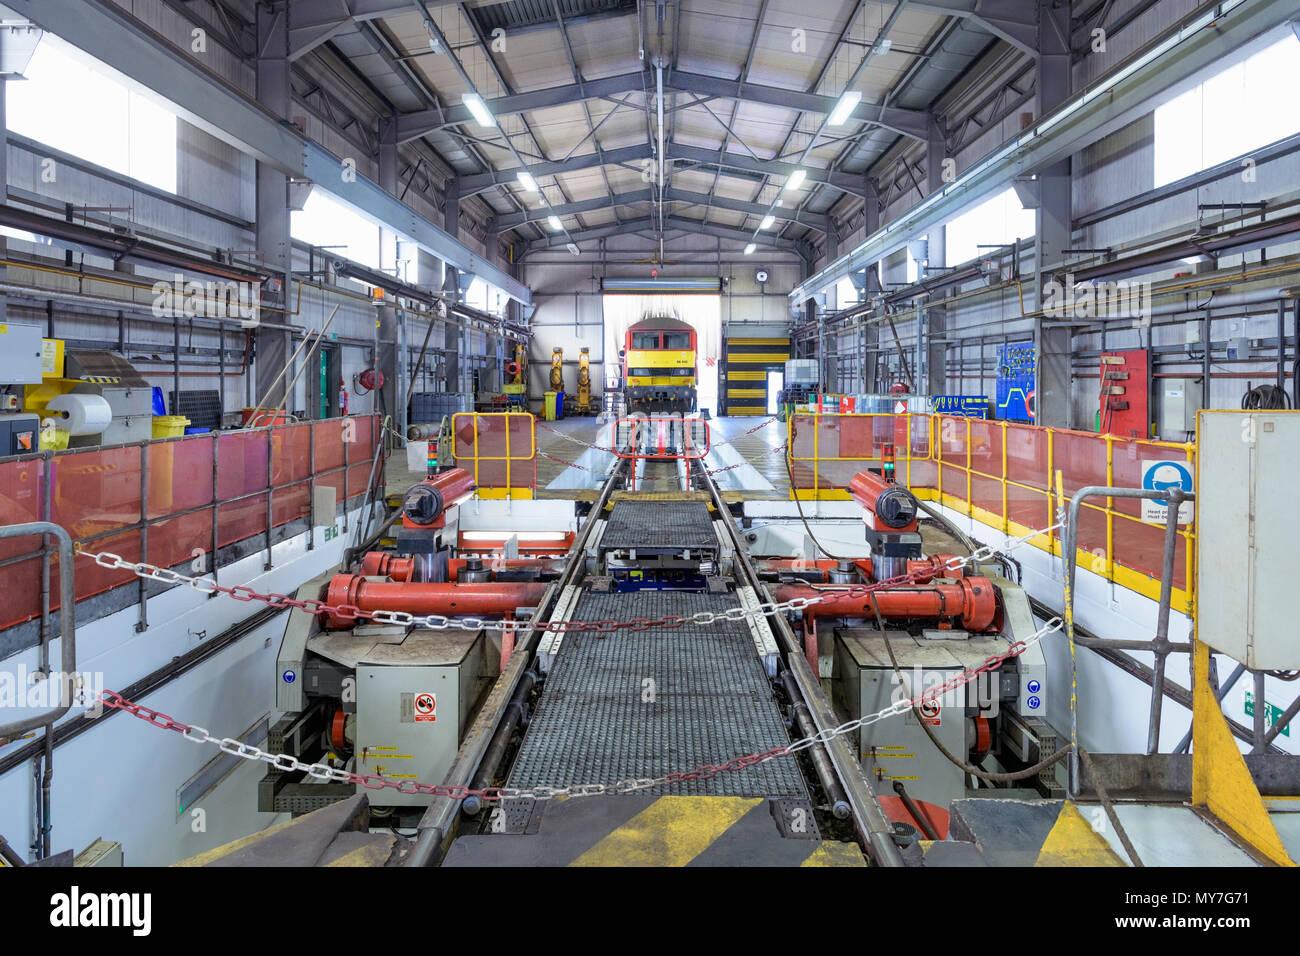 Locomotive approaching wheel lathe machine in train engineering factory - Stock Image